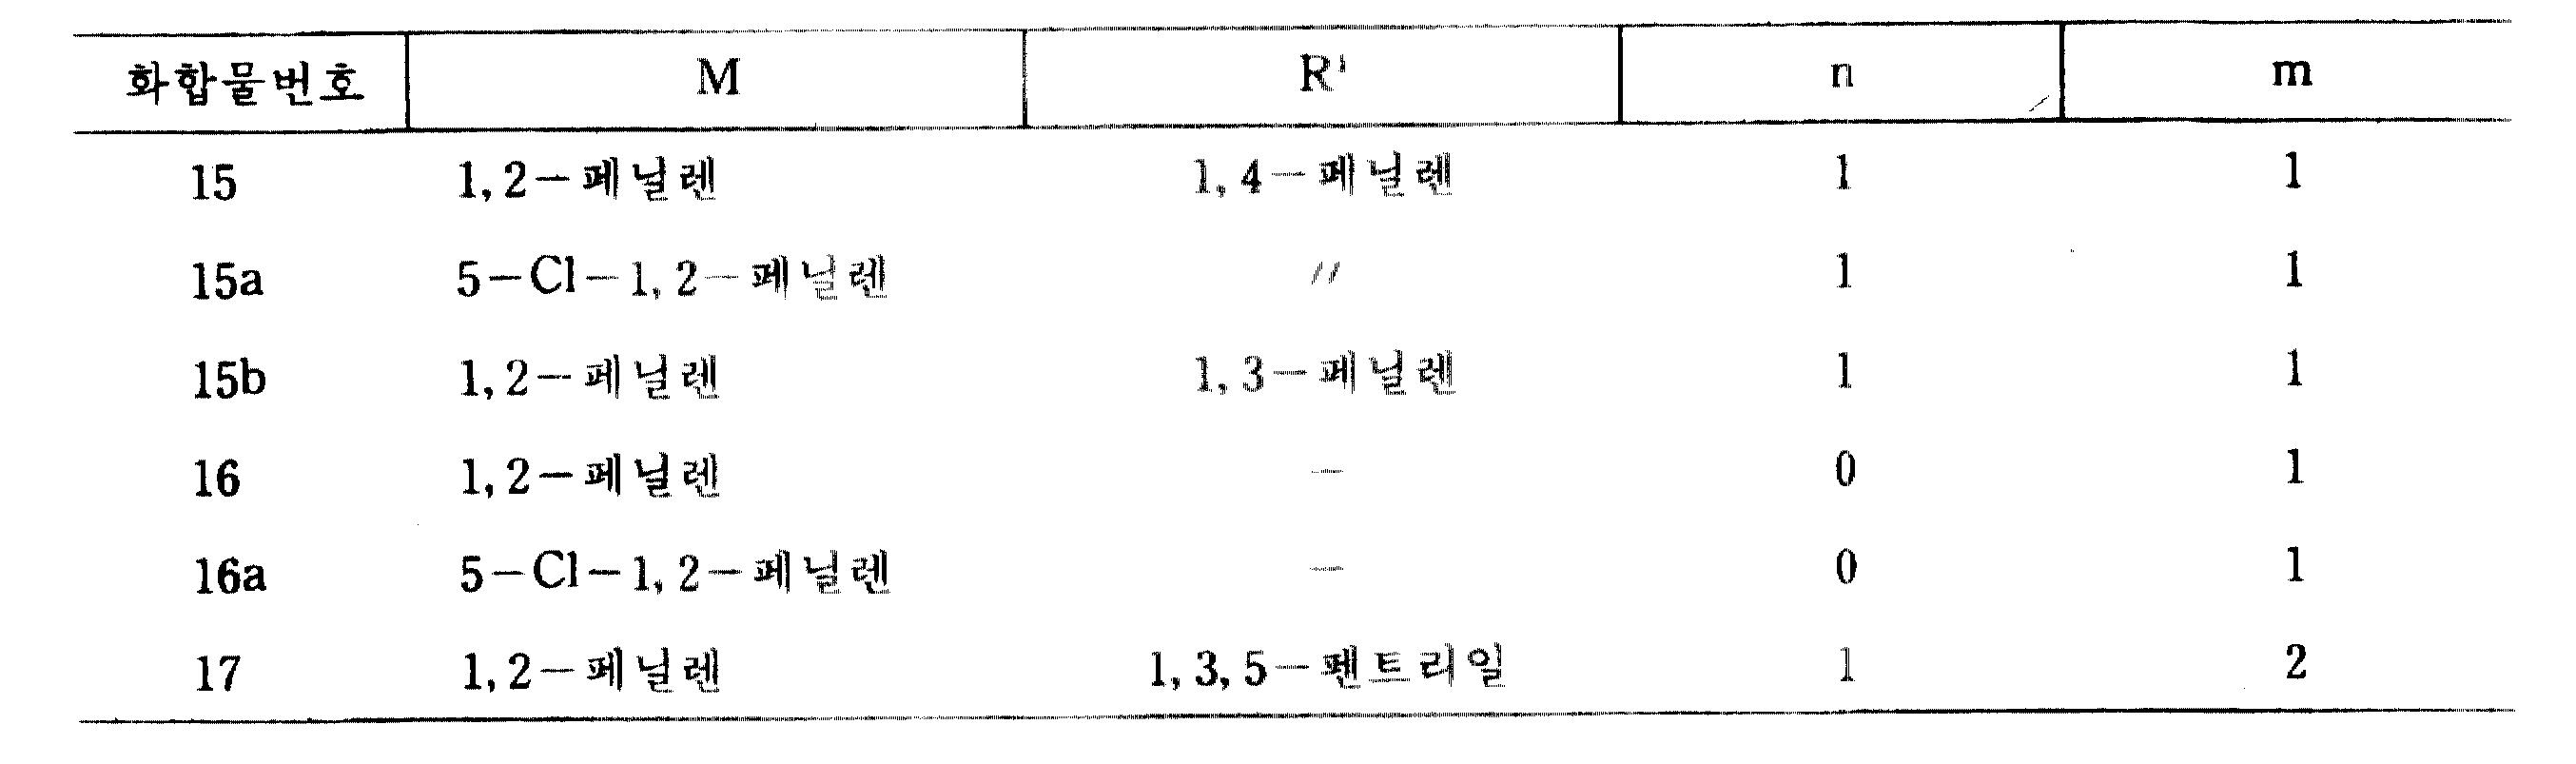 Figure kpo00006